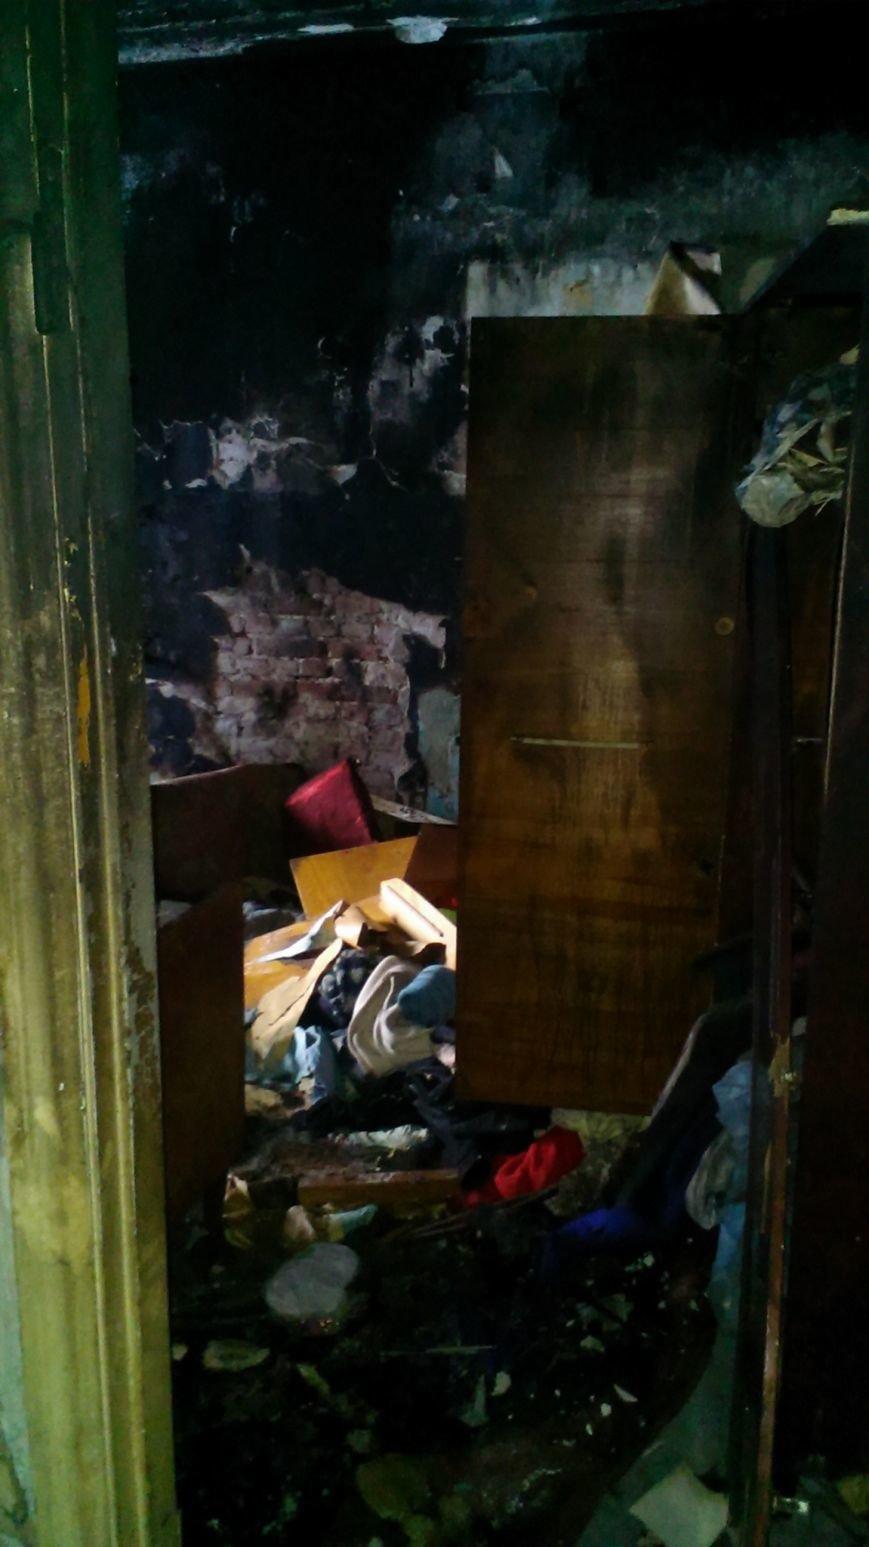 В Днепродзержинске 1 января 2 человека пострадало на пожаре (фото) - фото 5